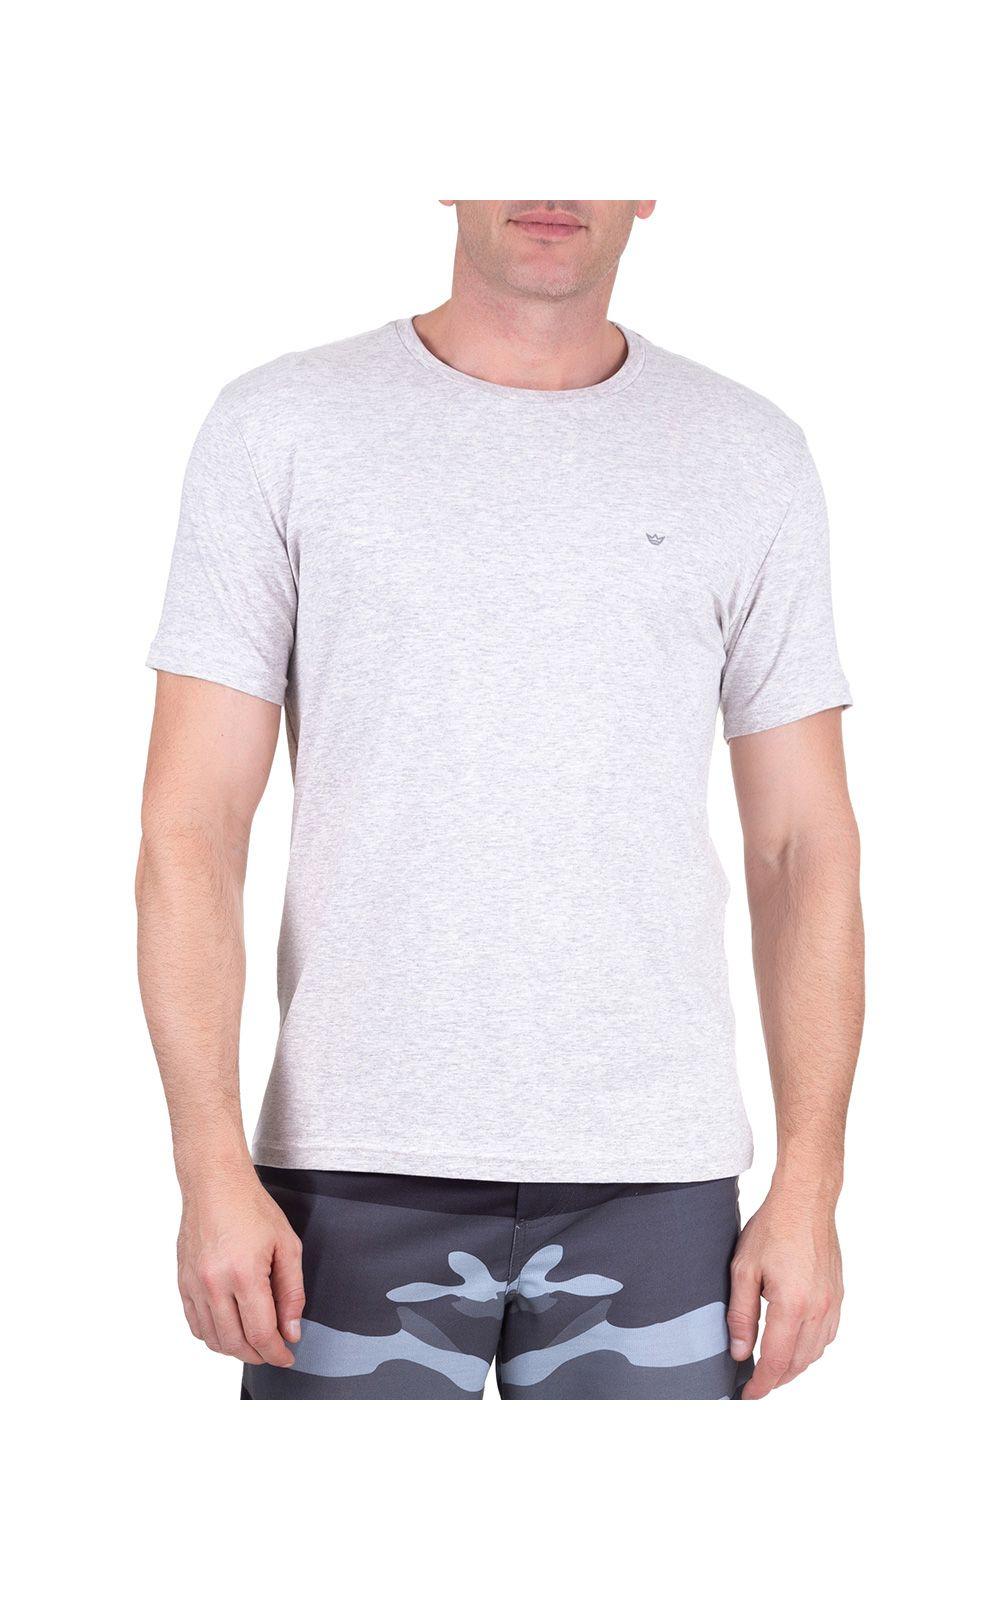 Foto 1 - Camiseta Masculina Cinza Claro Lisa